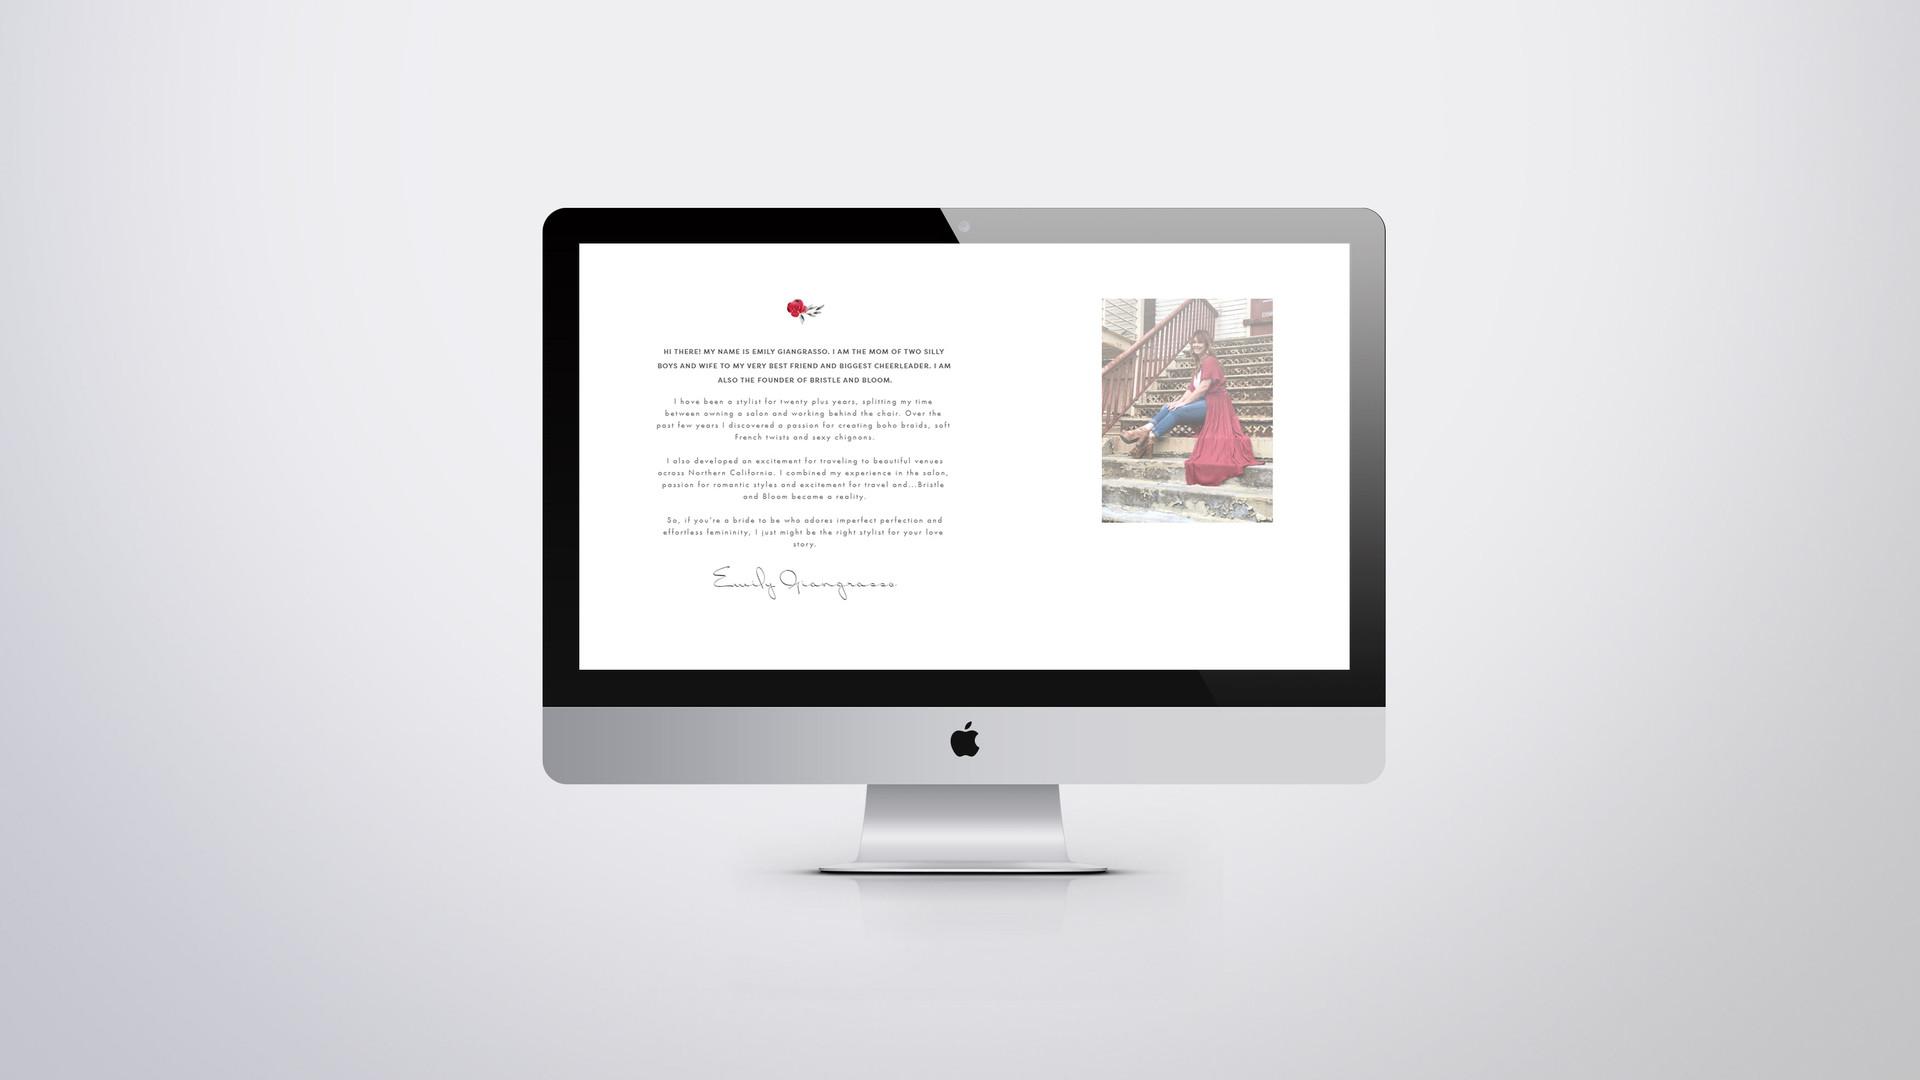 bb site 4.jpg